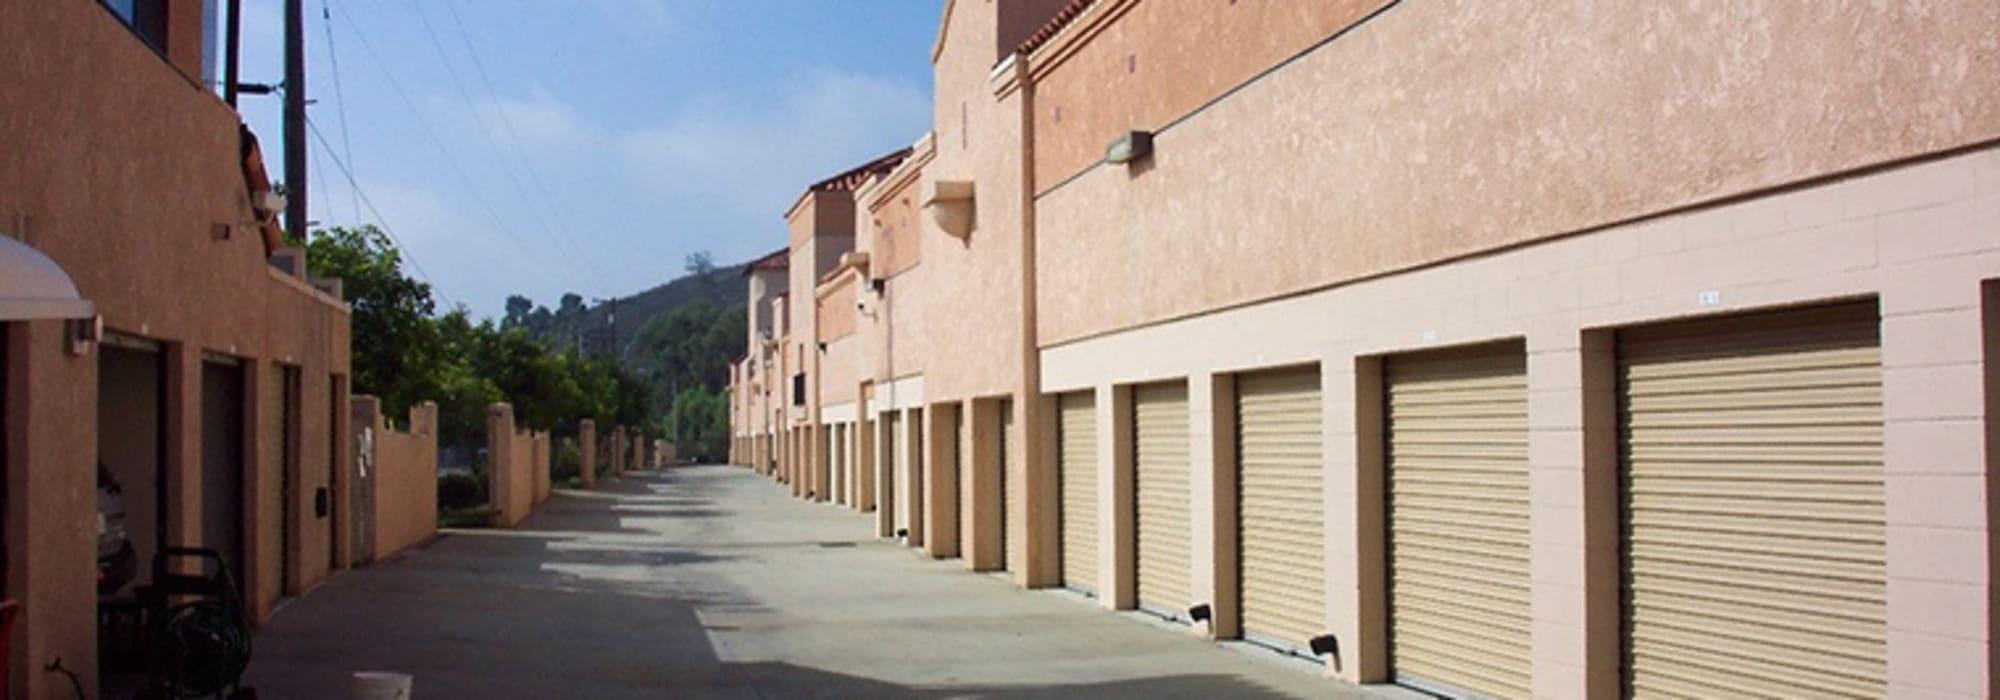 Outdoor units at North County Self Storage in Escondido, California